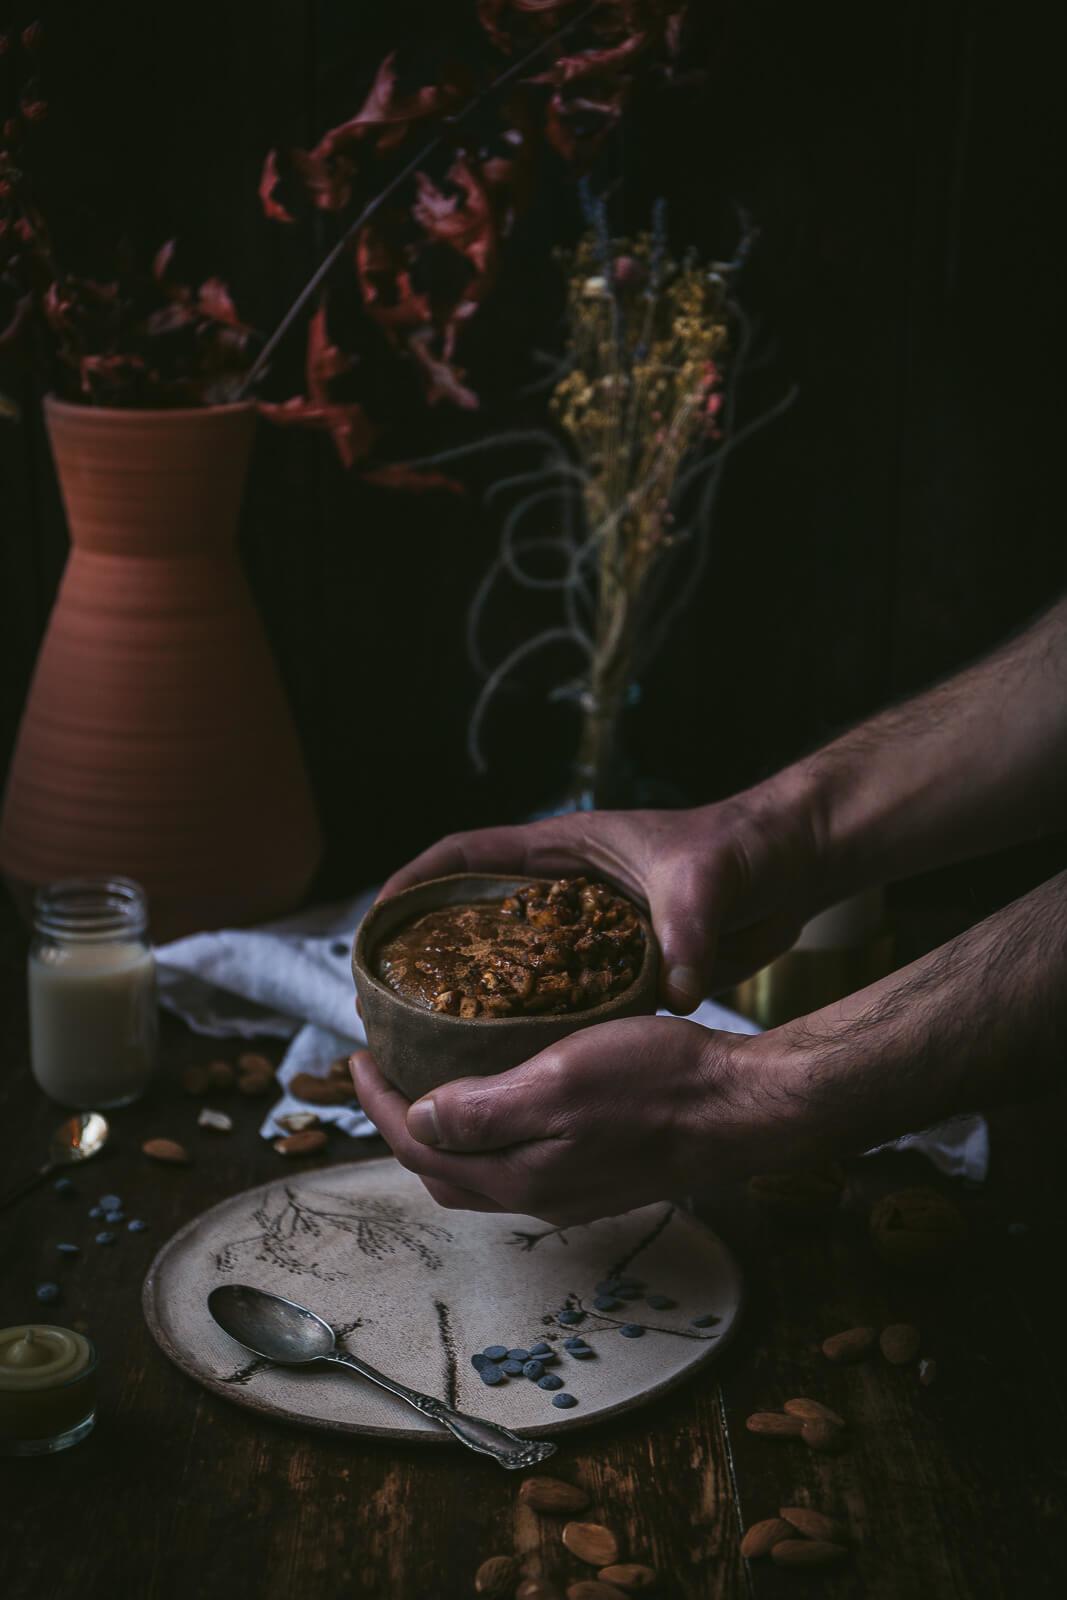 Dinkelvollkorngrieß, Dinkelgrieß, Dinkelgrießbrei, Grießbrei vegan, vegan Dinkelgrieß, vegan Frühstück, vegan Brei Frühstück Rezept, Dinkelgrießbrei mit Vanille, Dinkelgrieß mit Vanille